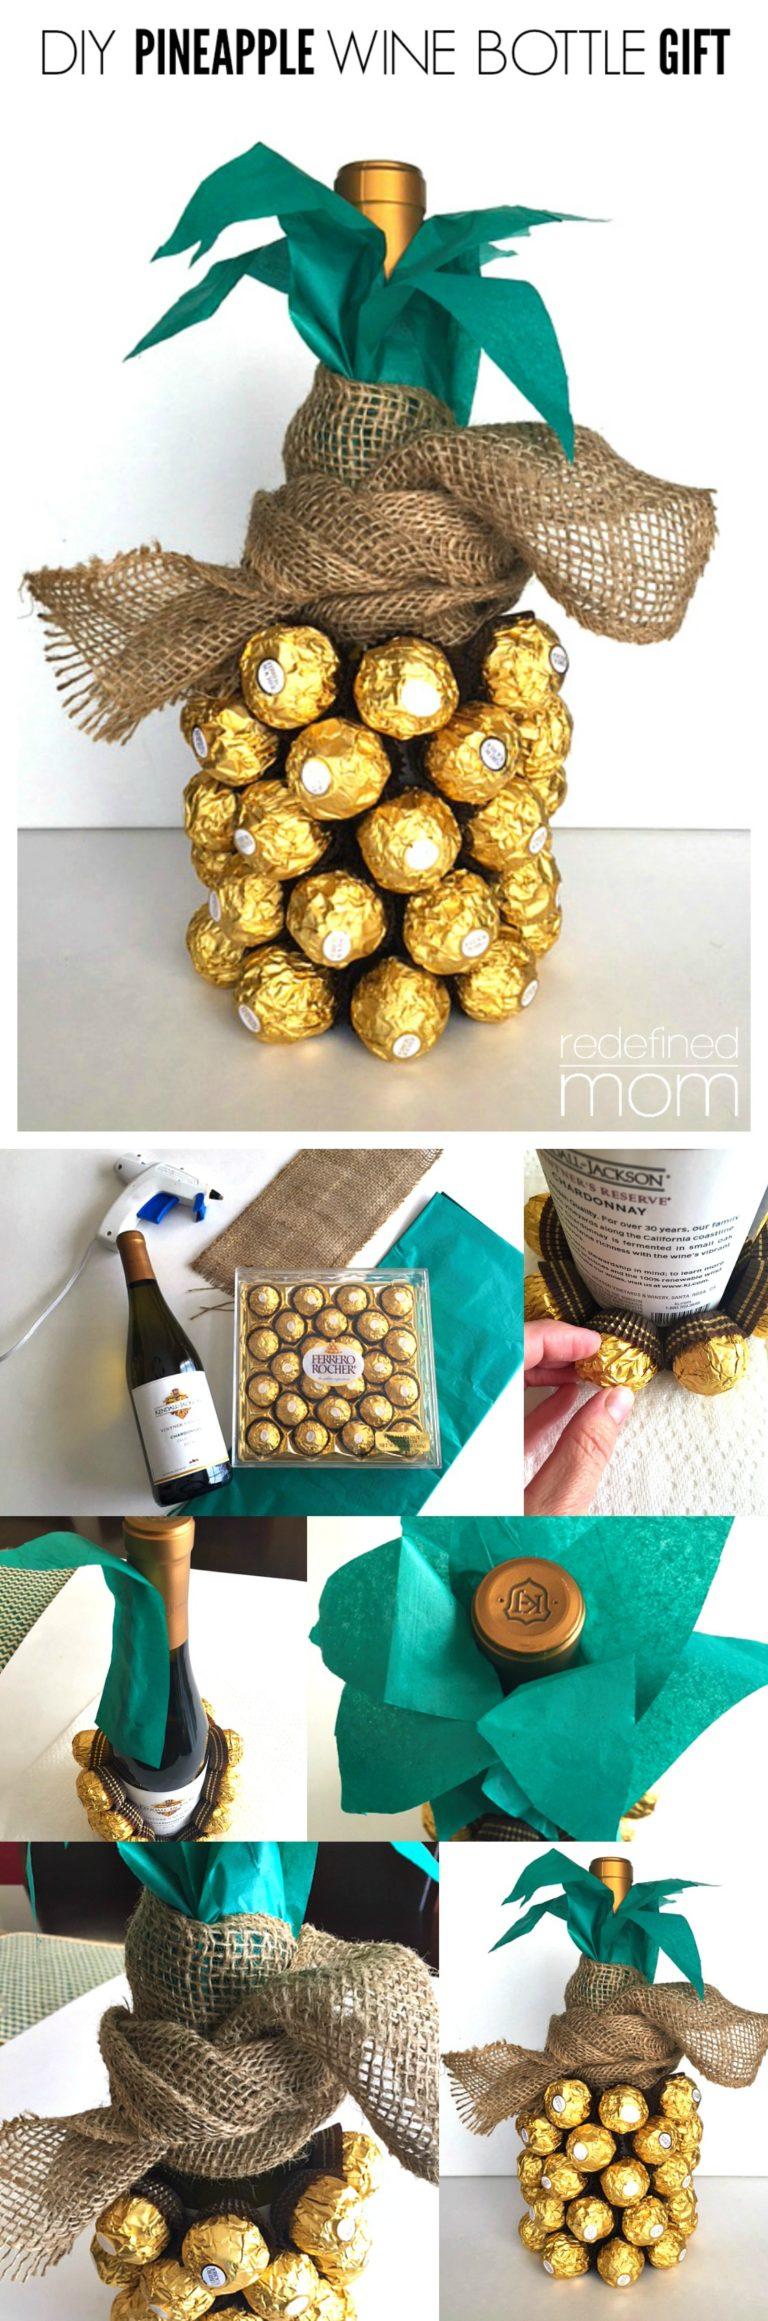 DIY-Ananas-Vinflaska-Choklad-present-Collage.jpg